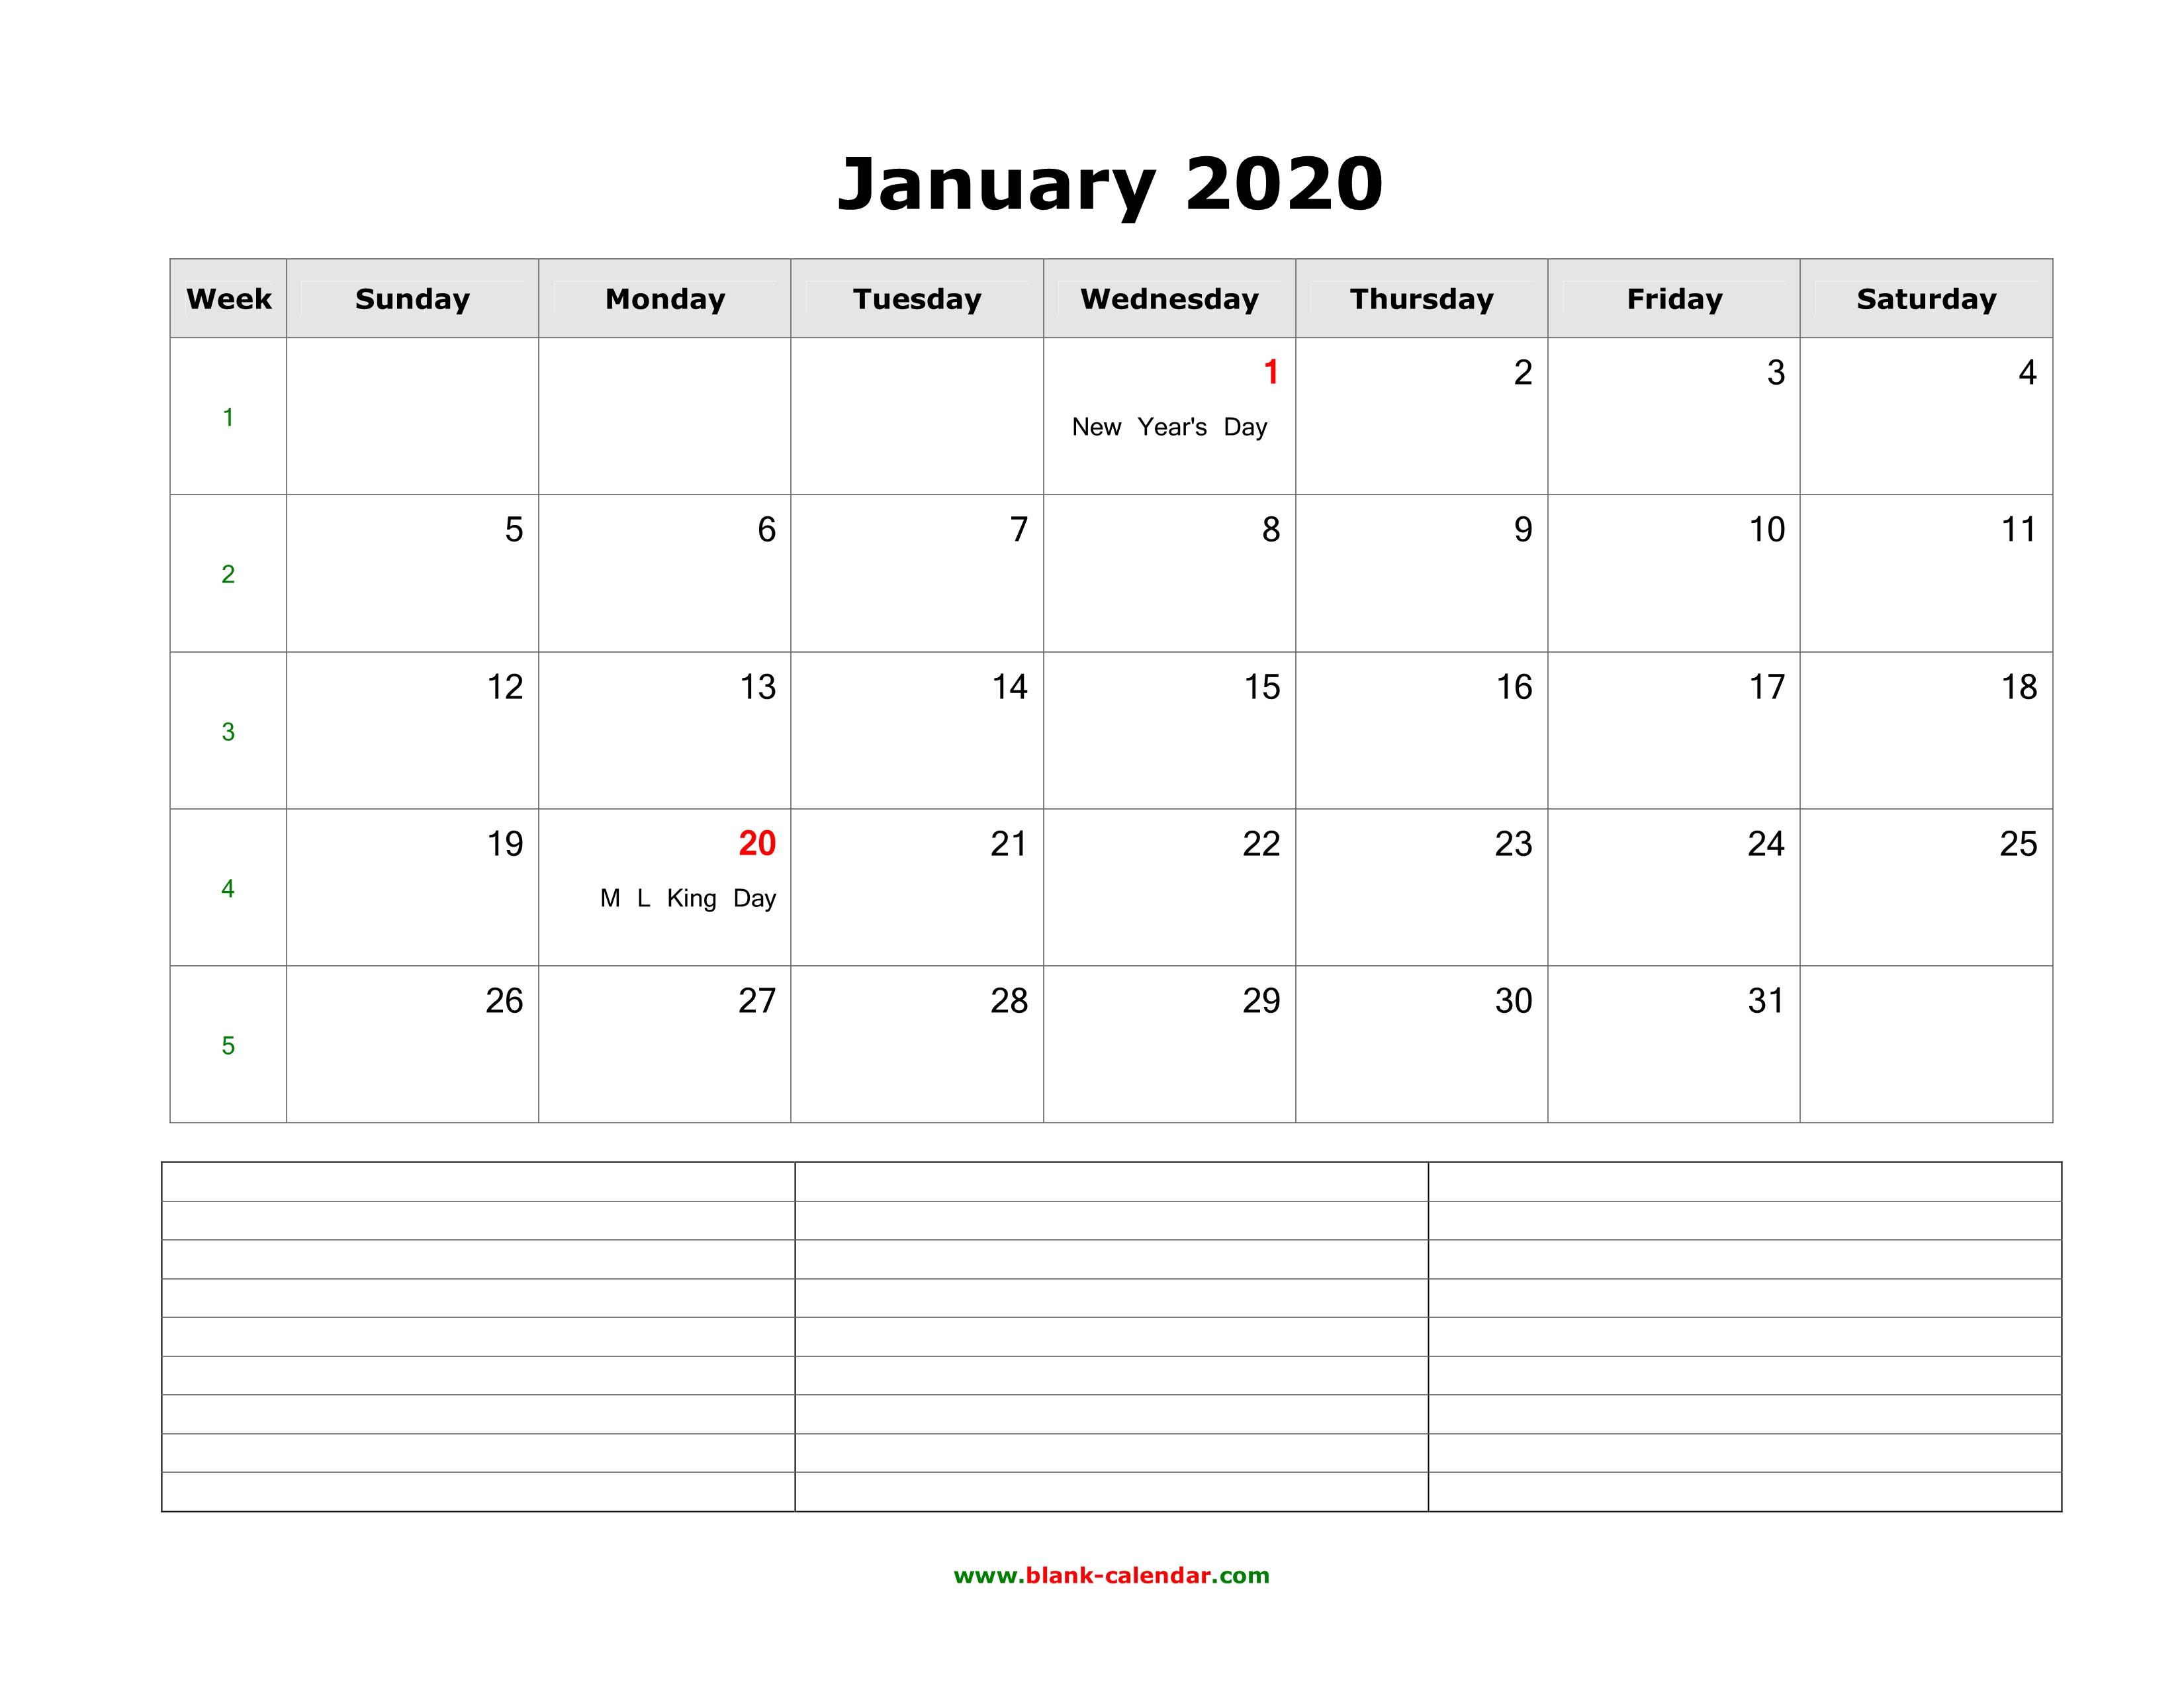 calender for january 2020